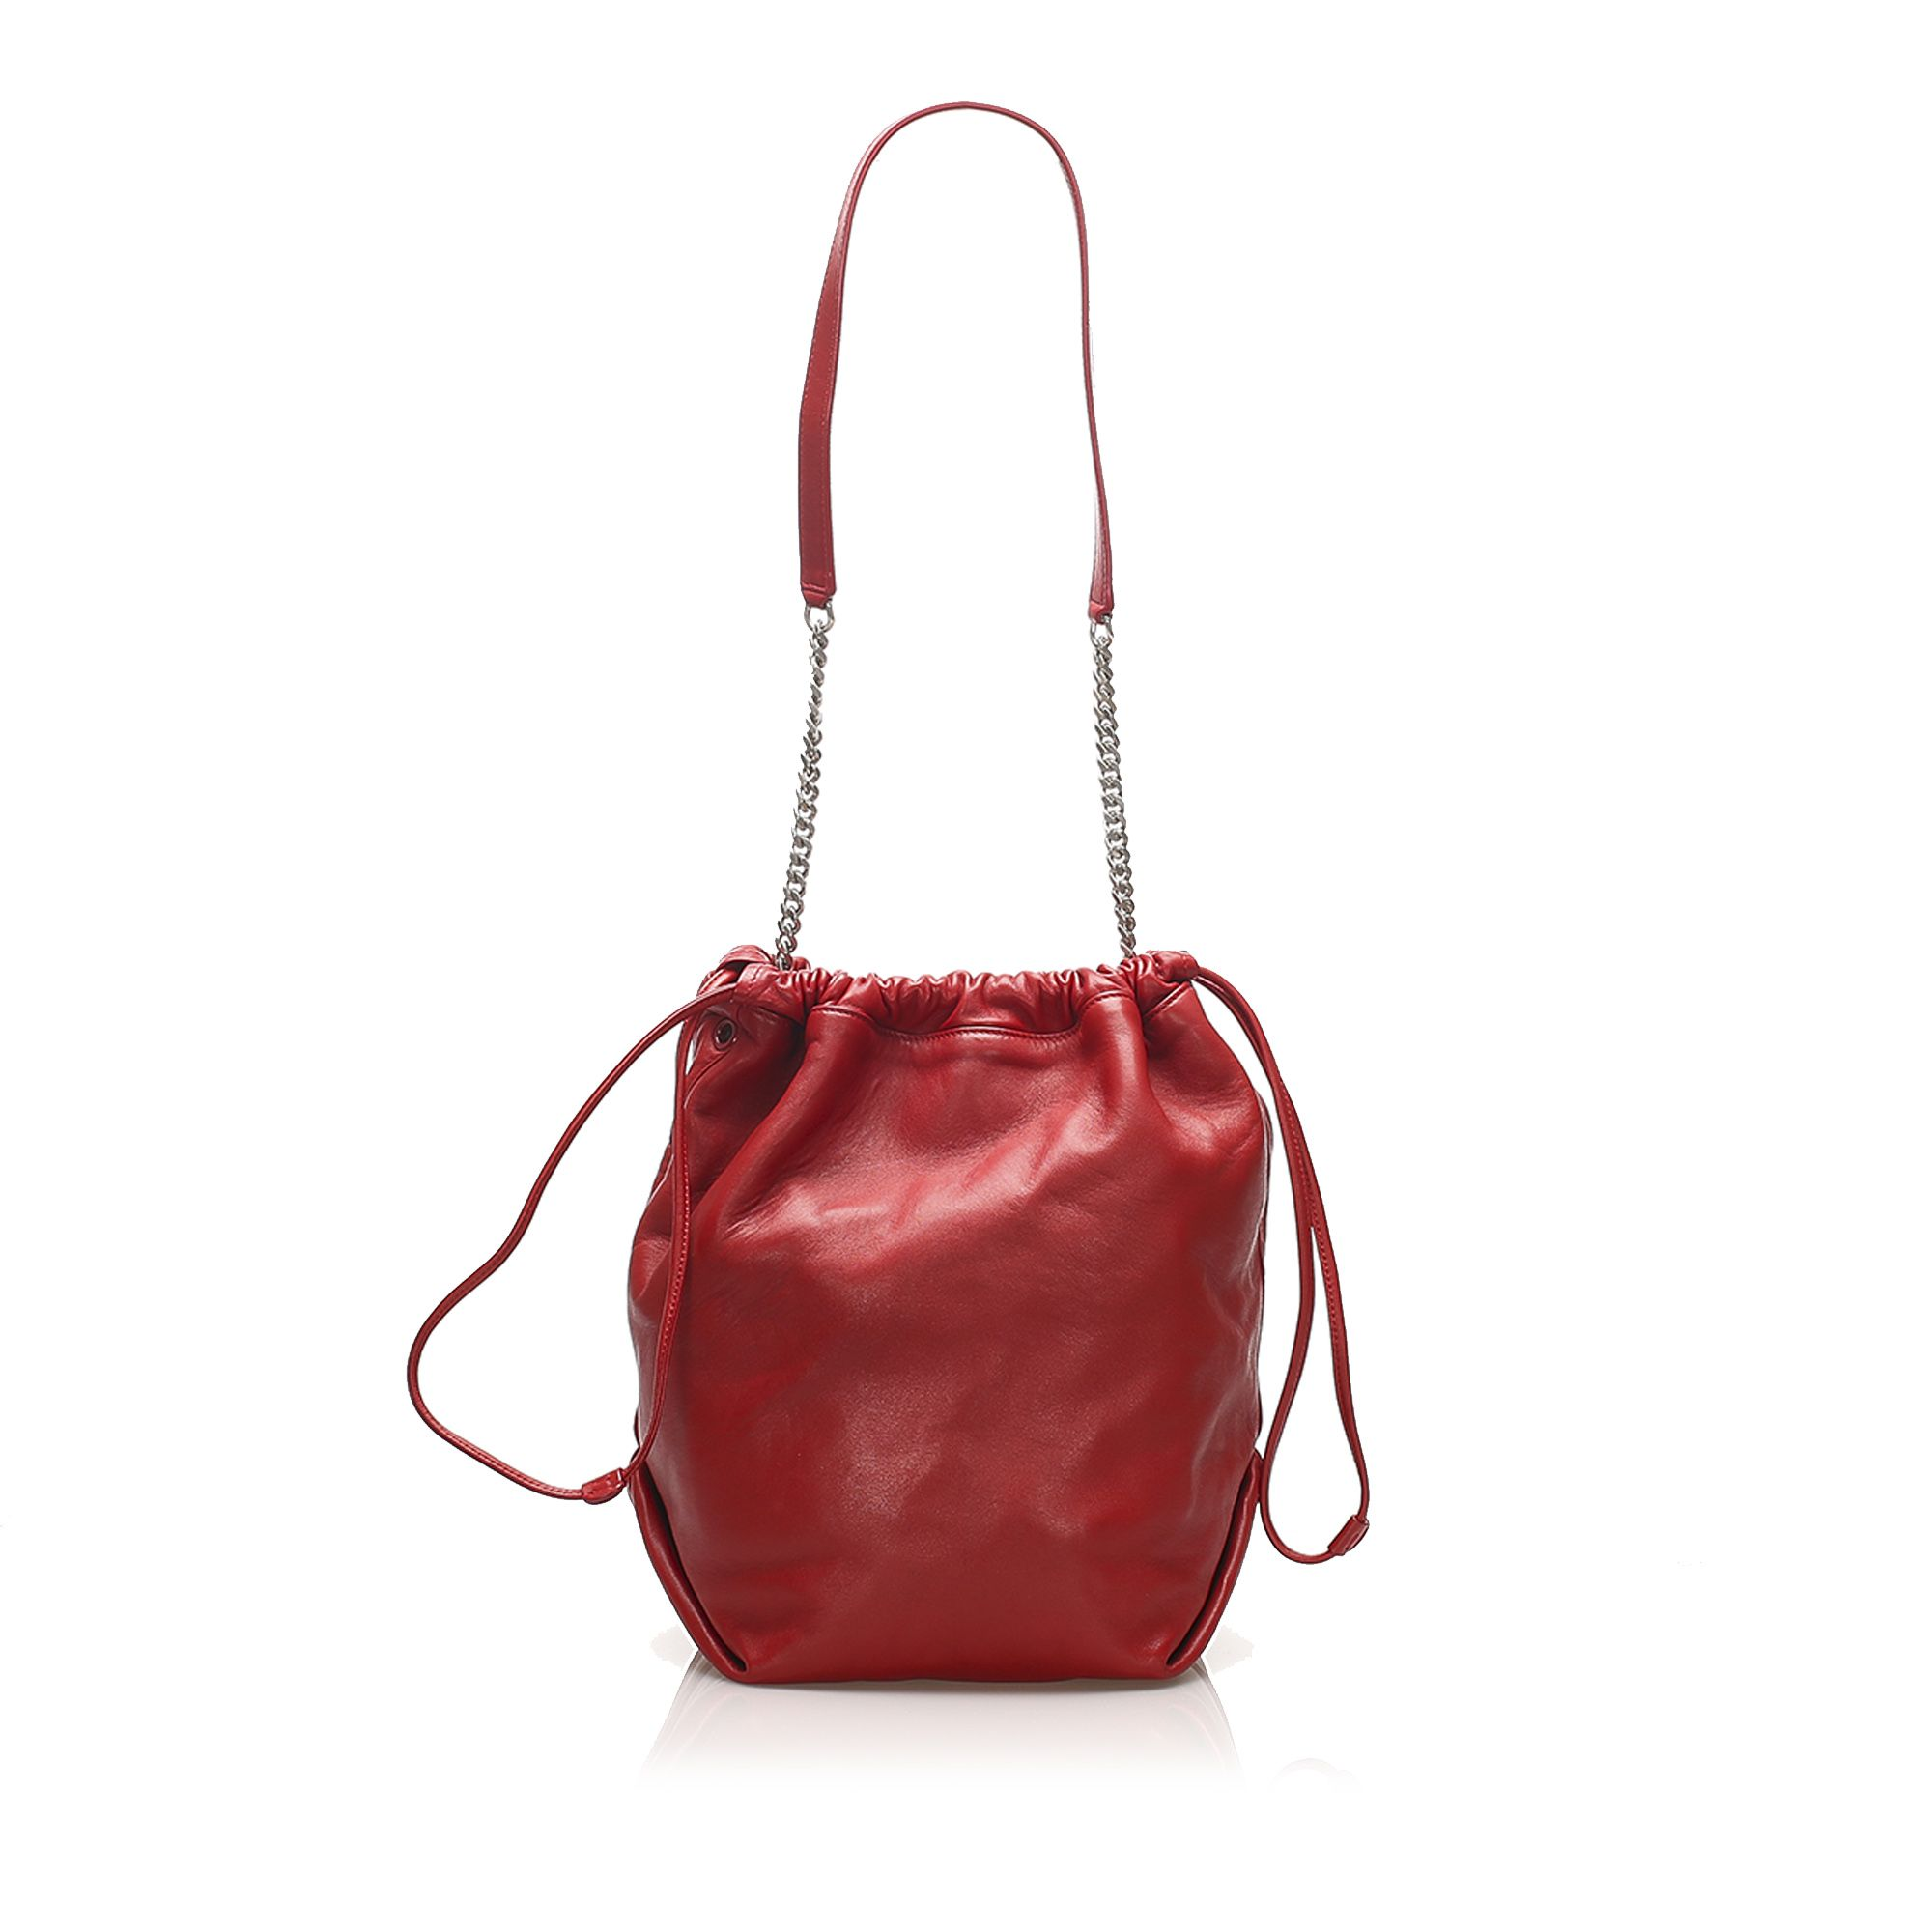 Vintage YSL Teddy Leather Bucket Bag Red